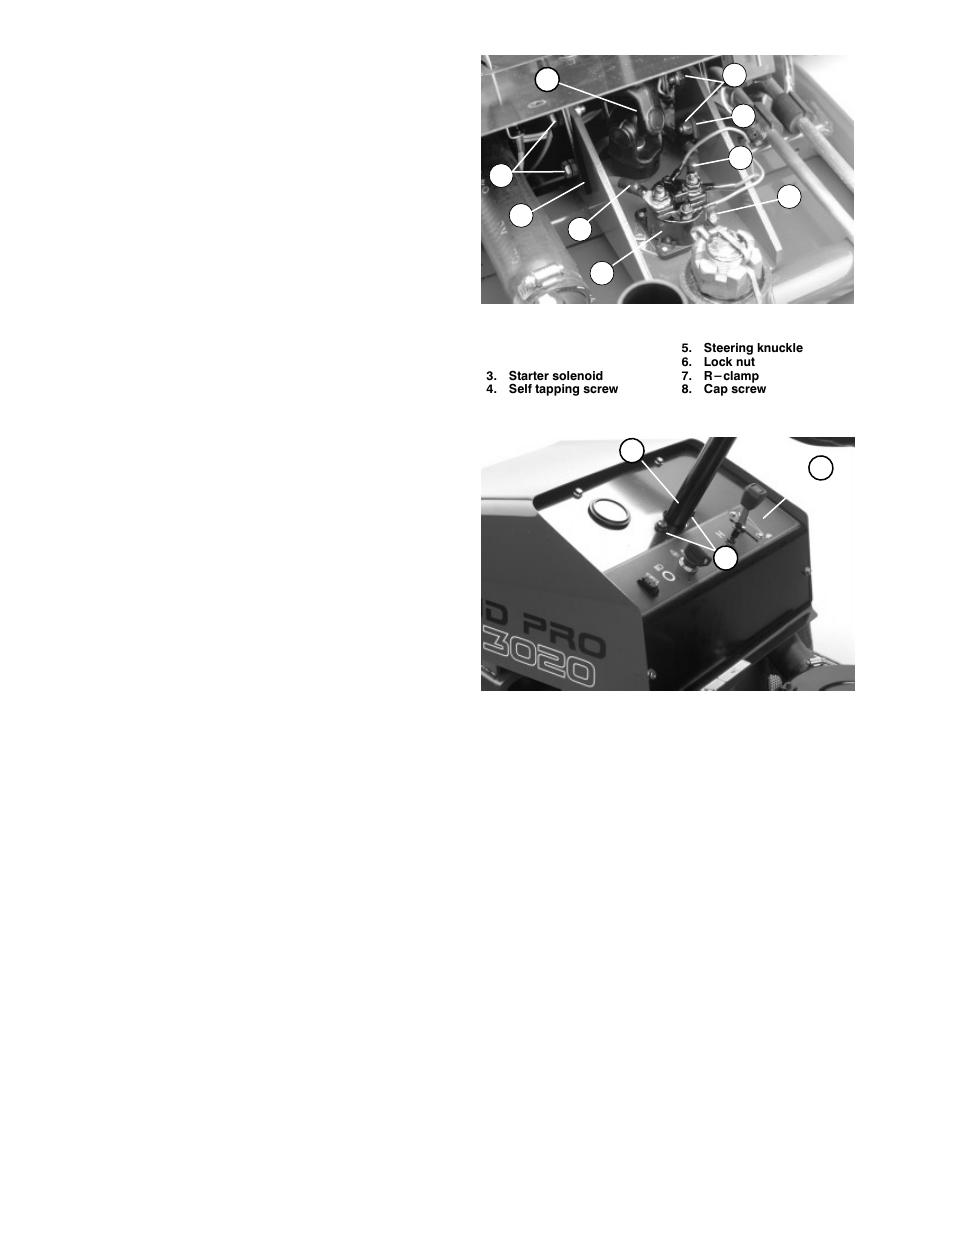 medium resolution of toro sand pro 5020 user manual page 160 170 original modetoro sand pro 5020 user manual